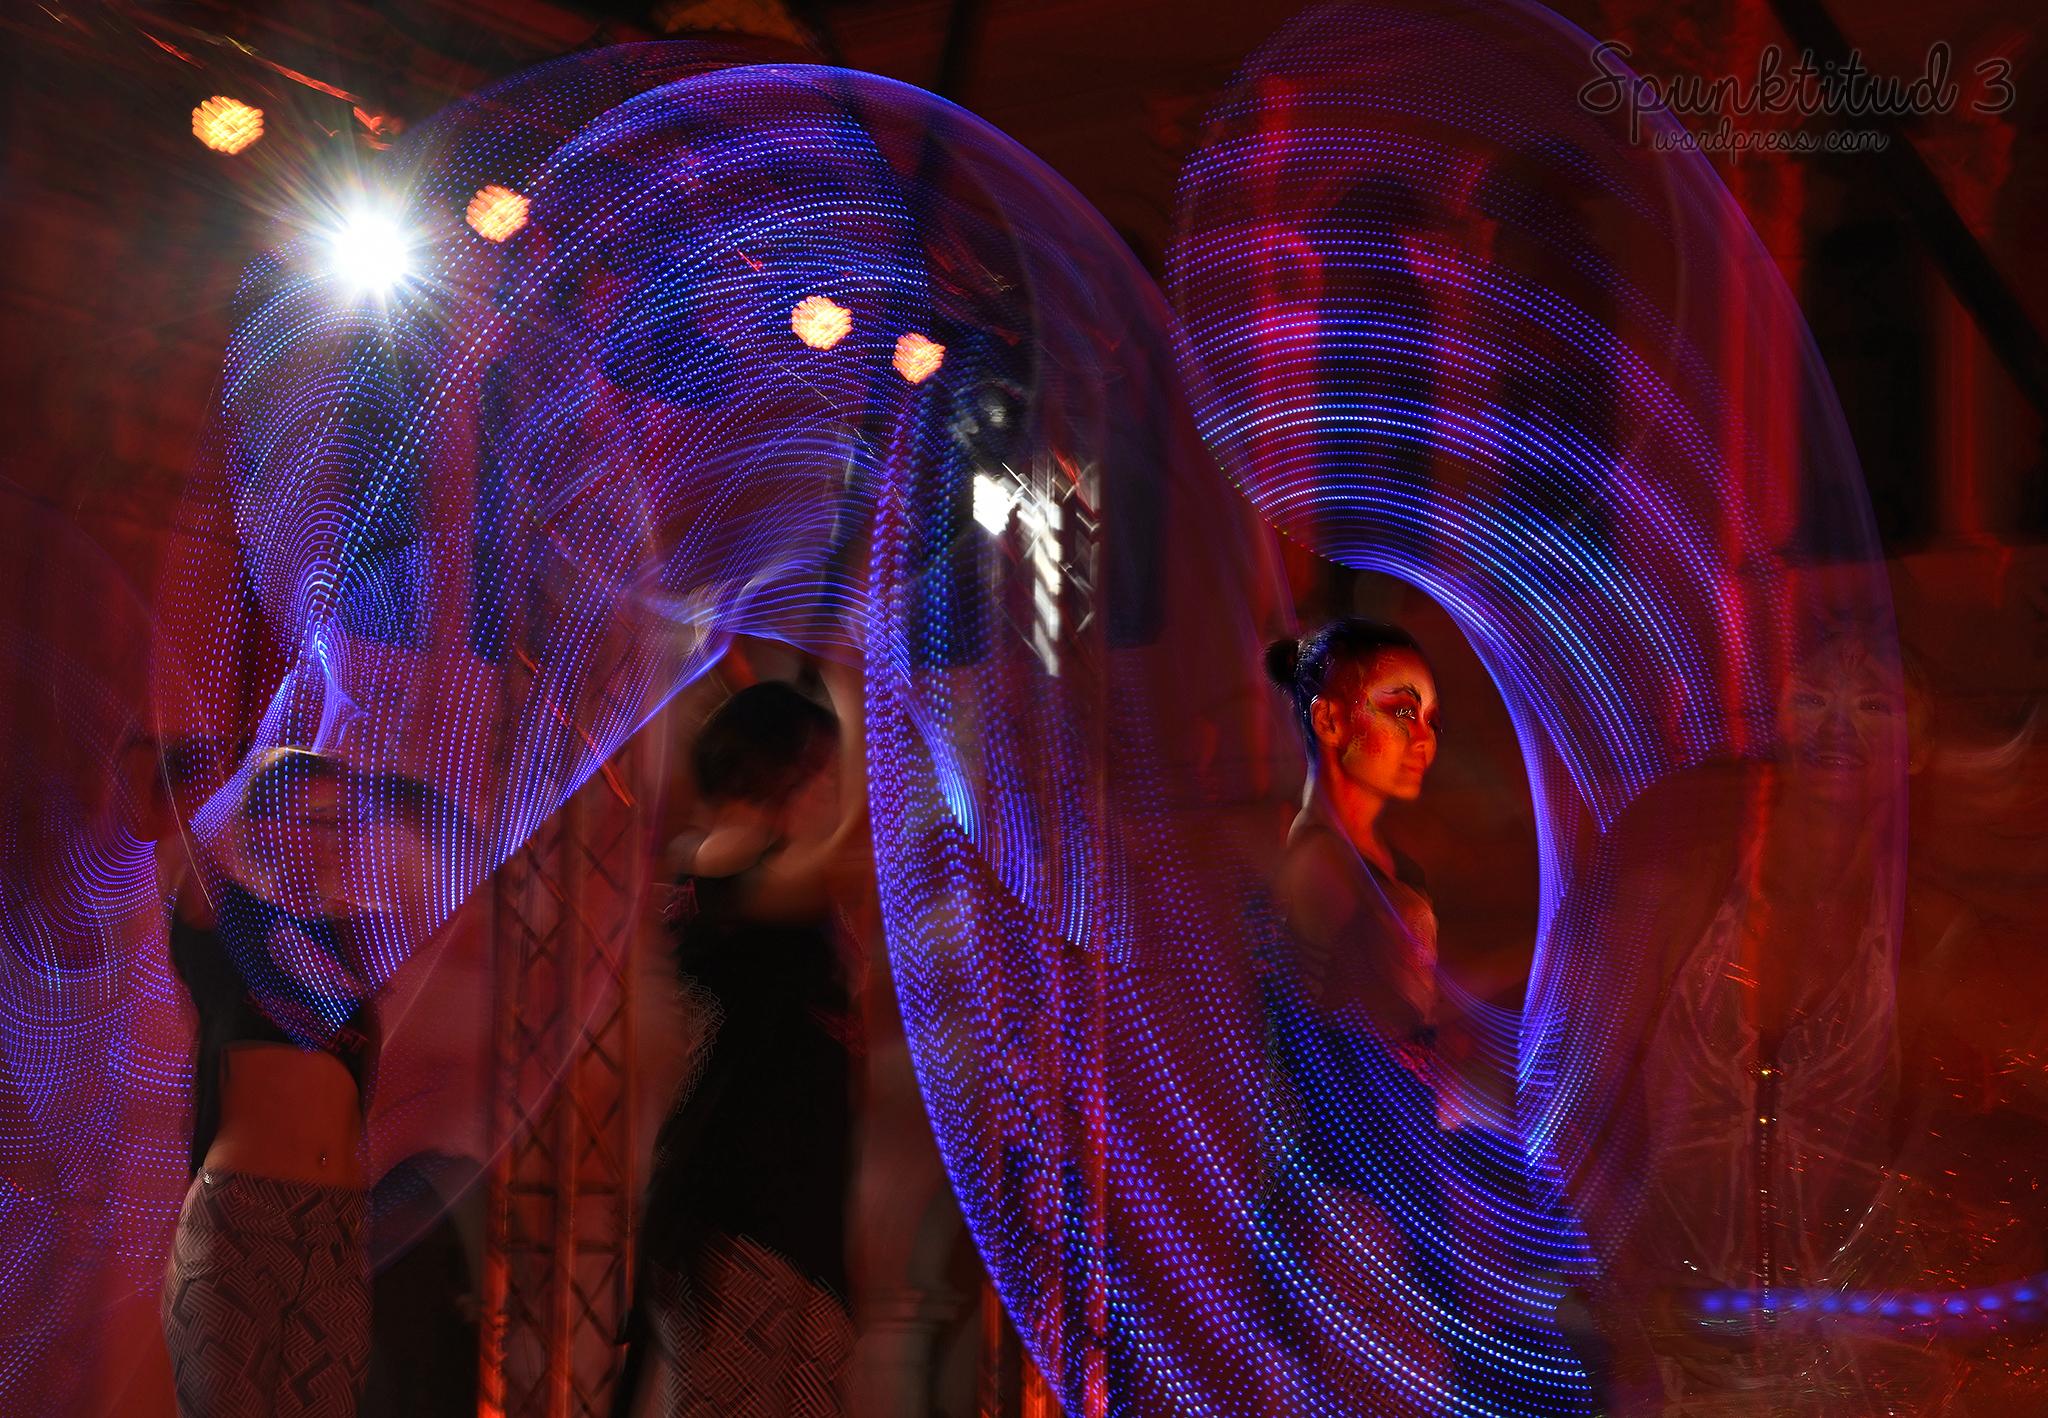 Starlight Alchemy at Singapore Night Festival